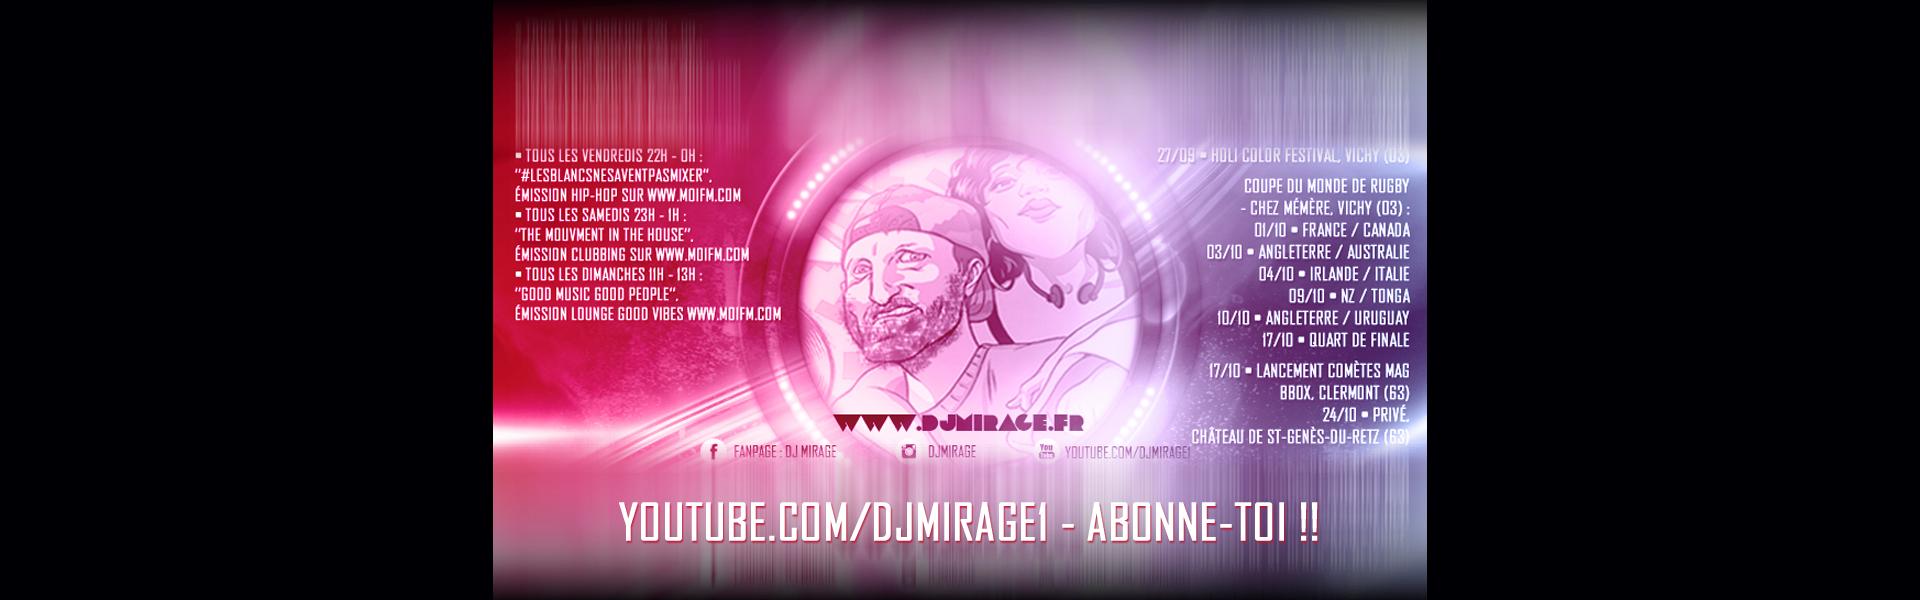 http://djmirage.fr/wp-content/uploads/2014/01/slider-accueil-deejaymirage-rentrée-15.jpg